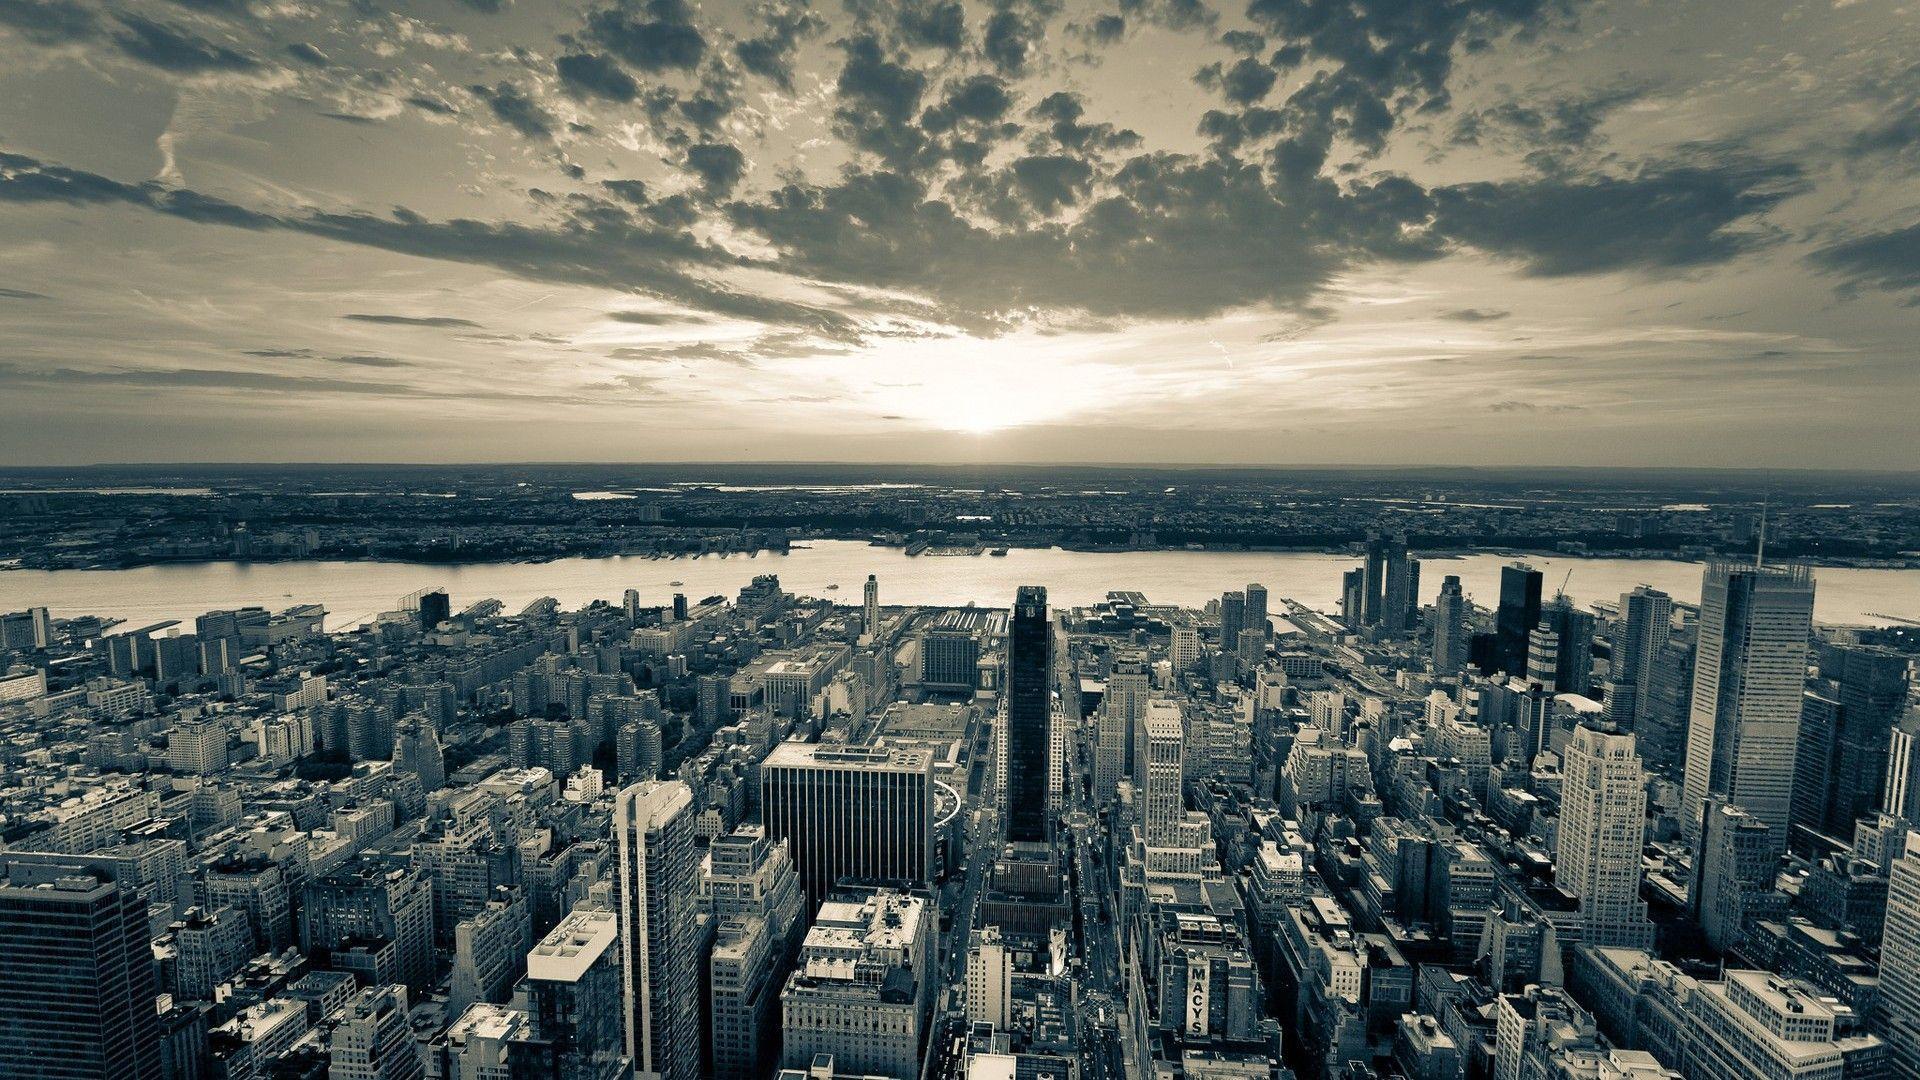 New York City Black And White Background City Wallpaper Cityscape Wallpaper City Skyline